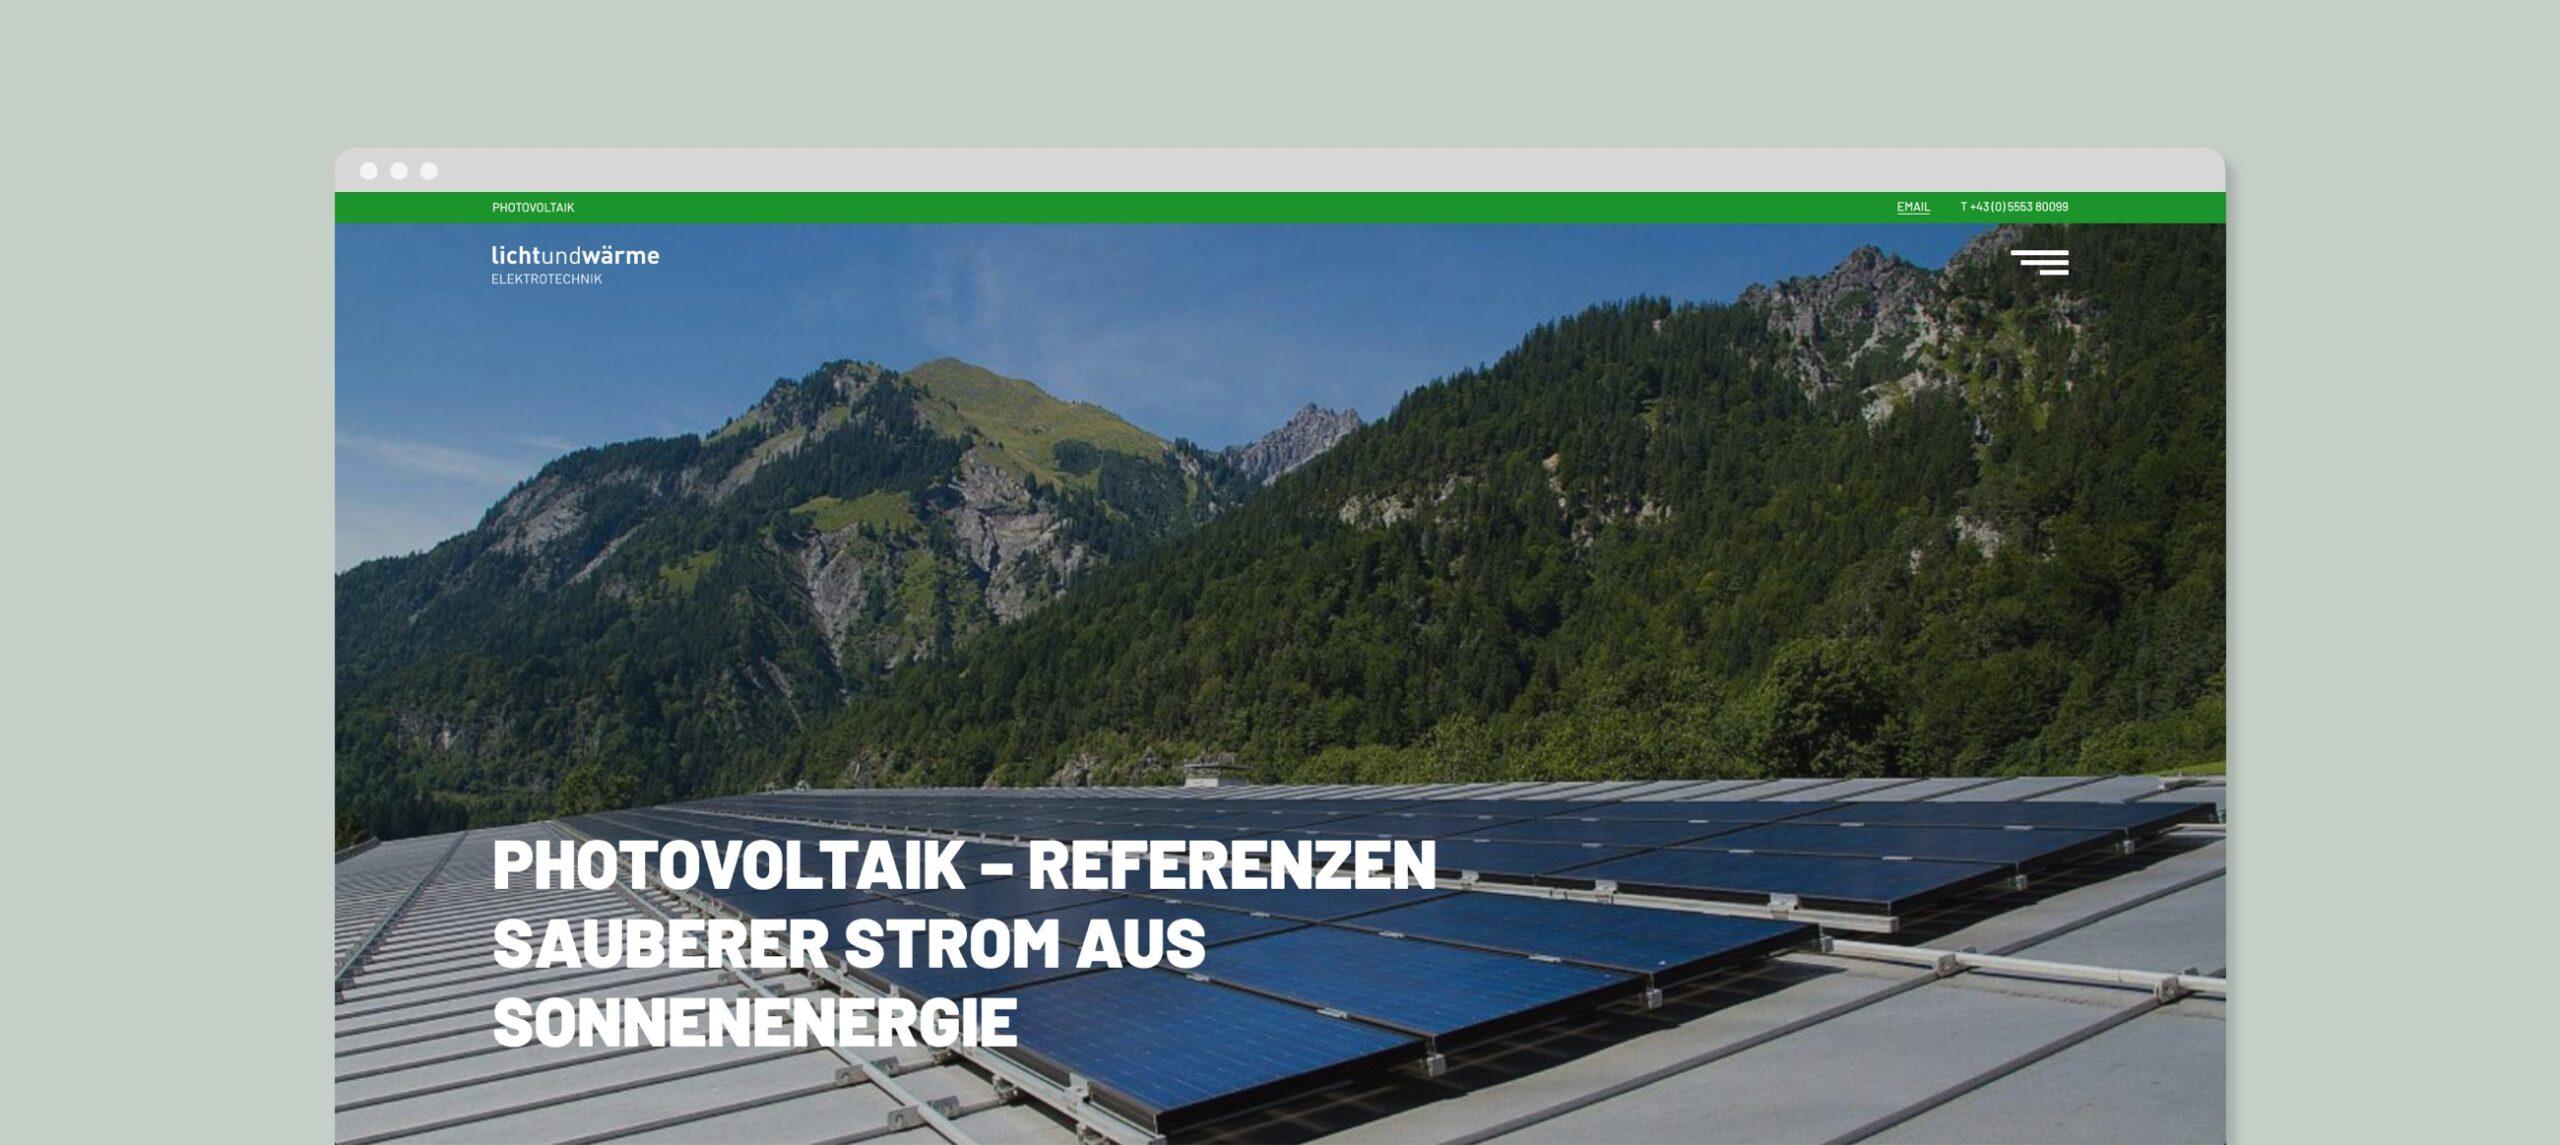 Lichtundwärme website screen design